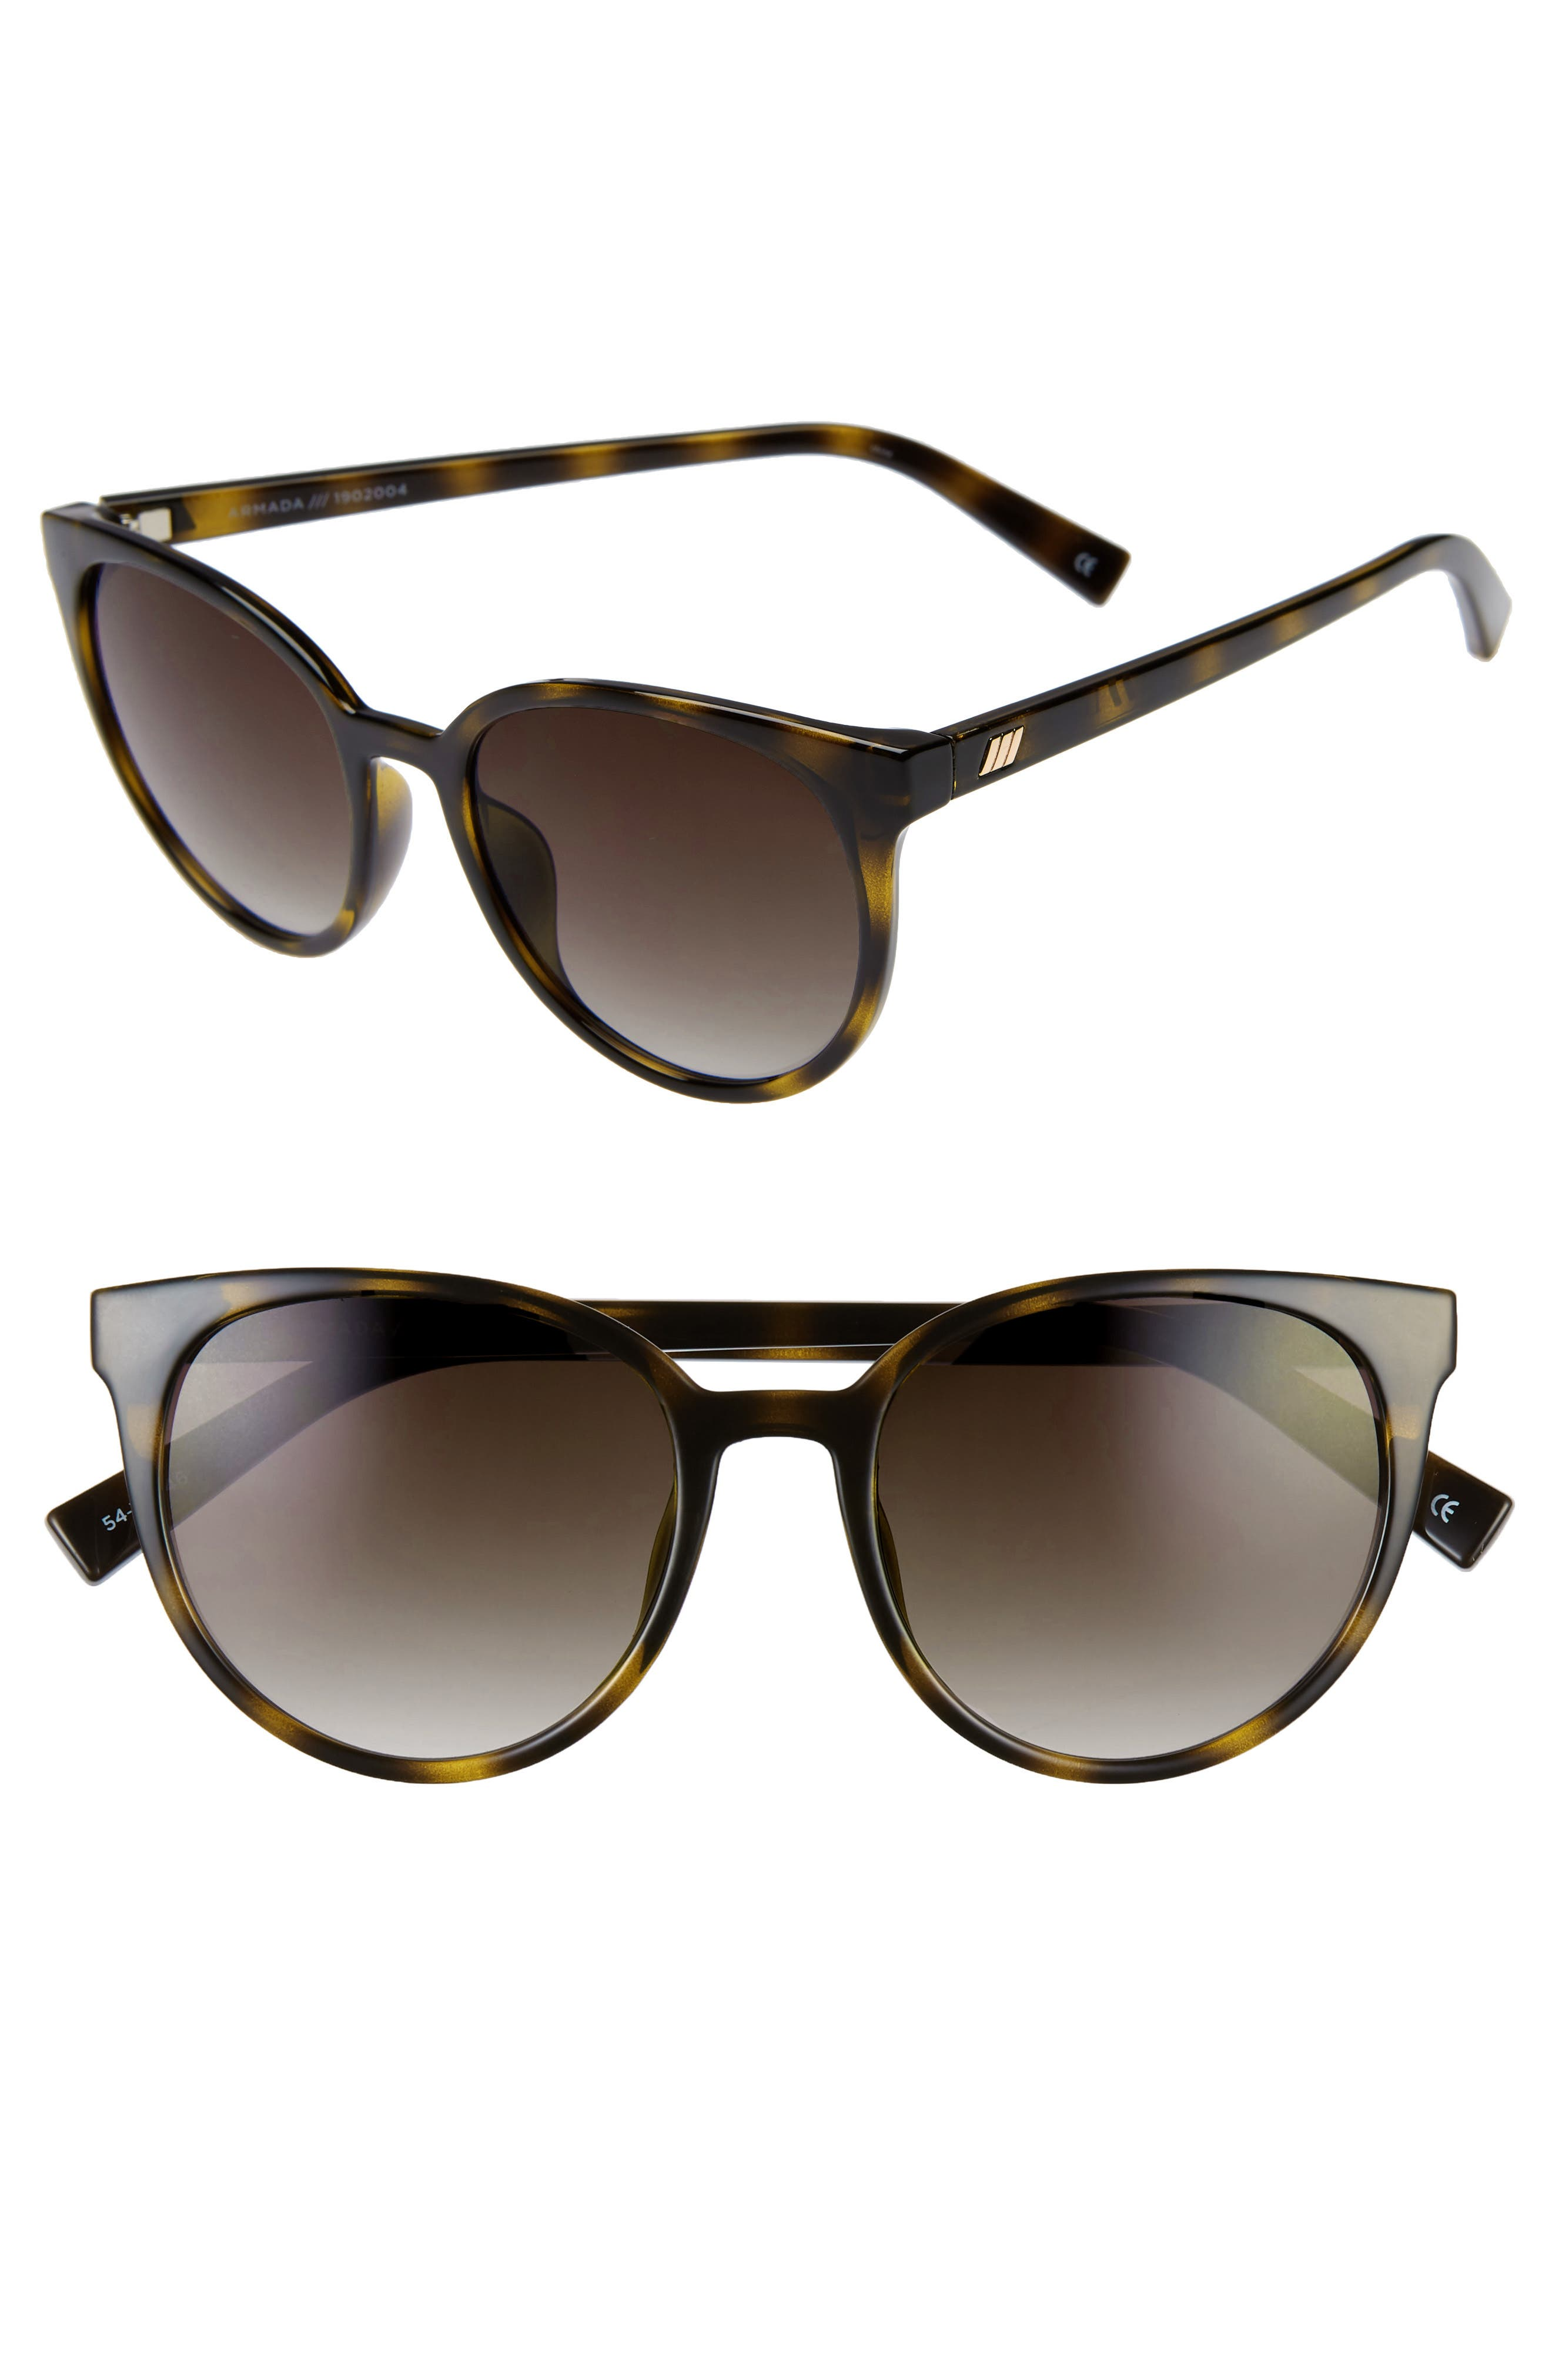 Le Specs Armada 5m Cat Eye Sunglasses - Tortoise/ Khaki Gradient